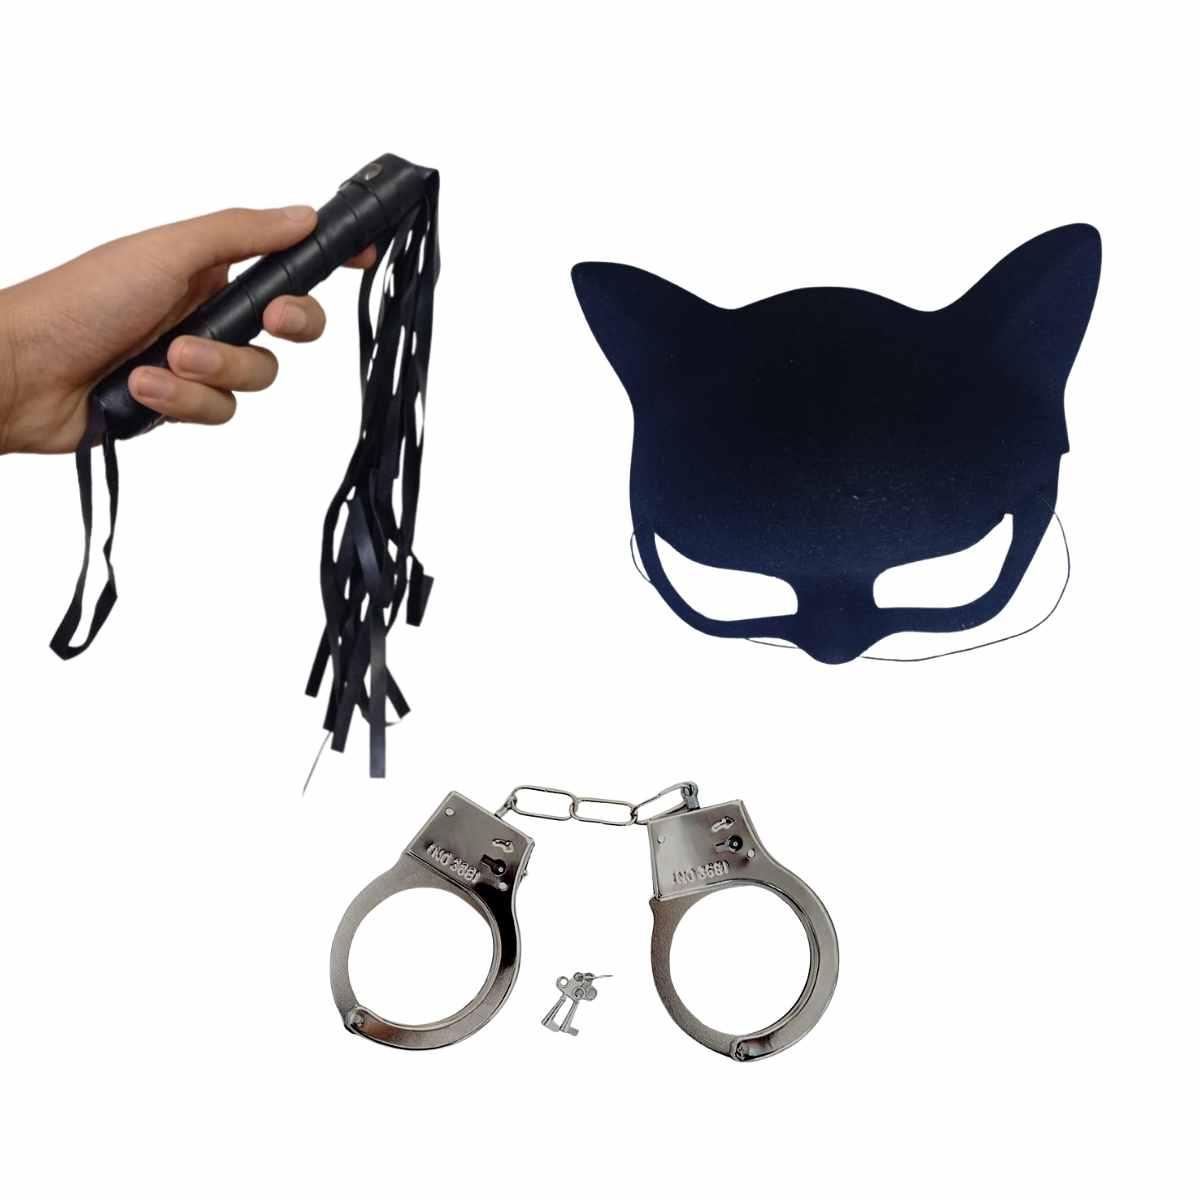 Kit Mulher Gato Sensual (Máscara + Chicote + Algema)